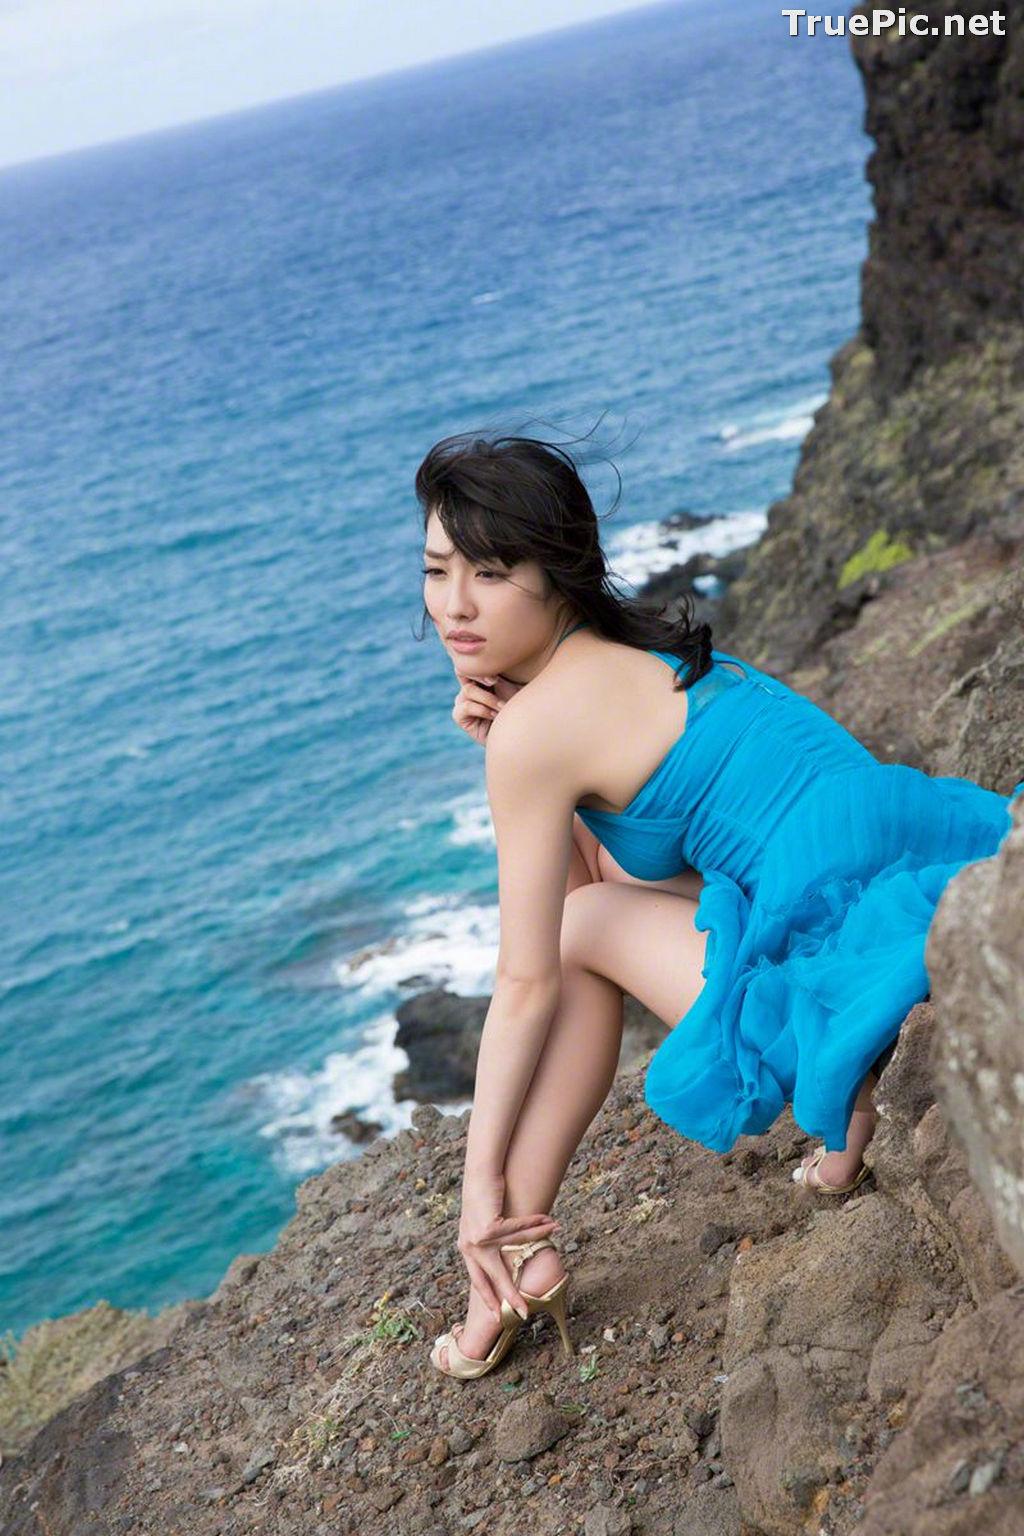 Image Wanibooks No.127 - Japanese Gravure Idol and Actress - Anna Konno - TruePic.net - Picture-8